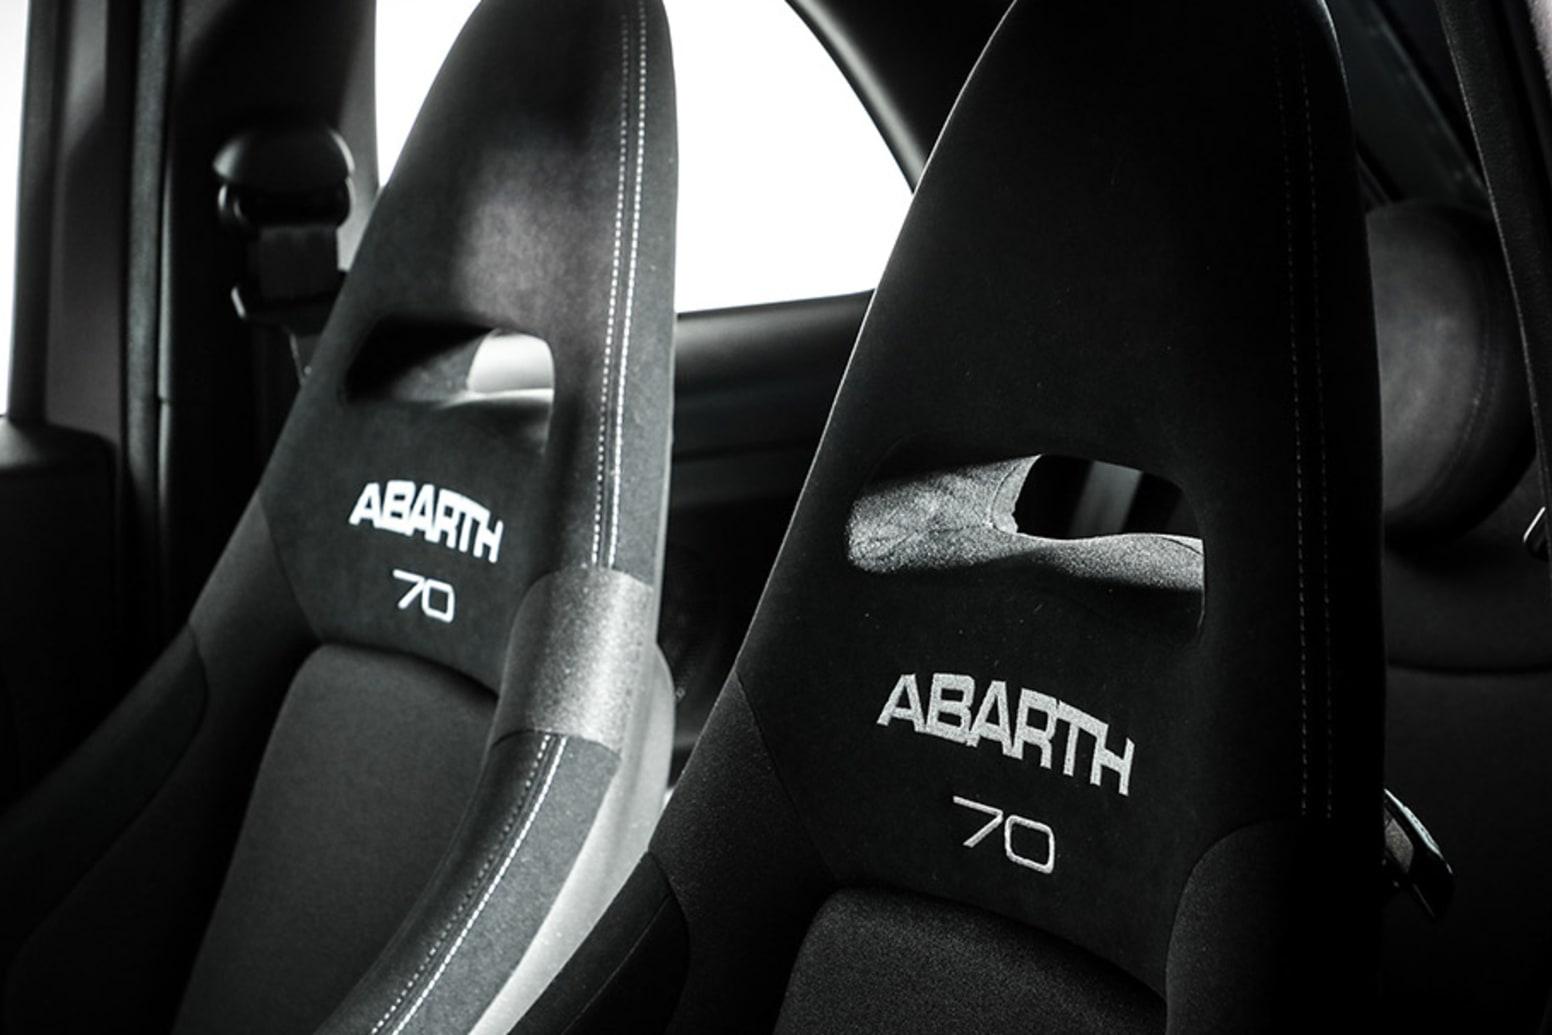 Abarth 595 Pista Interior Seats